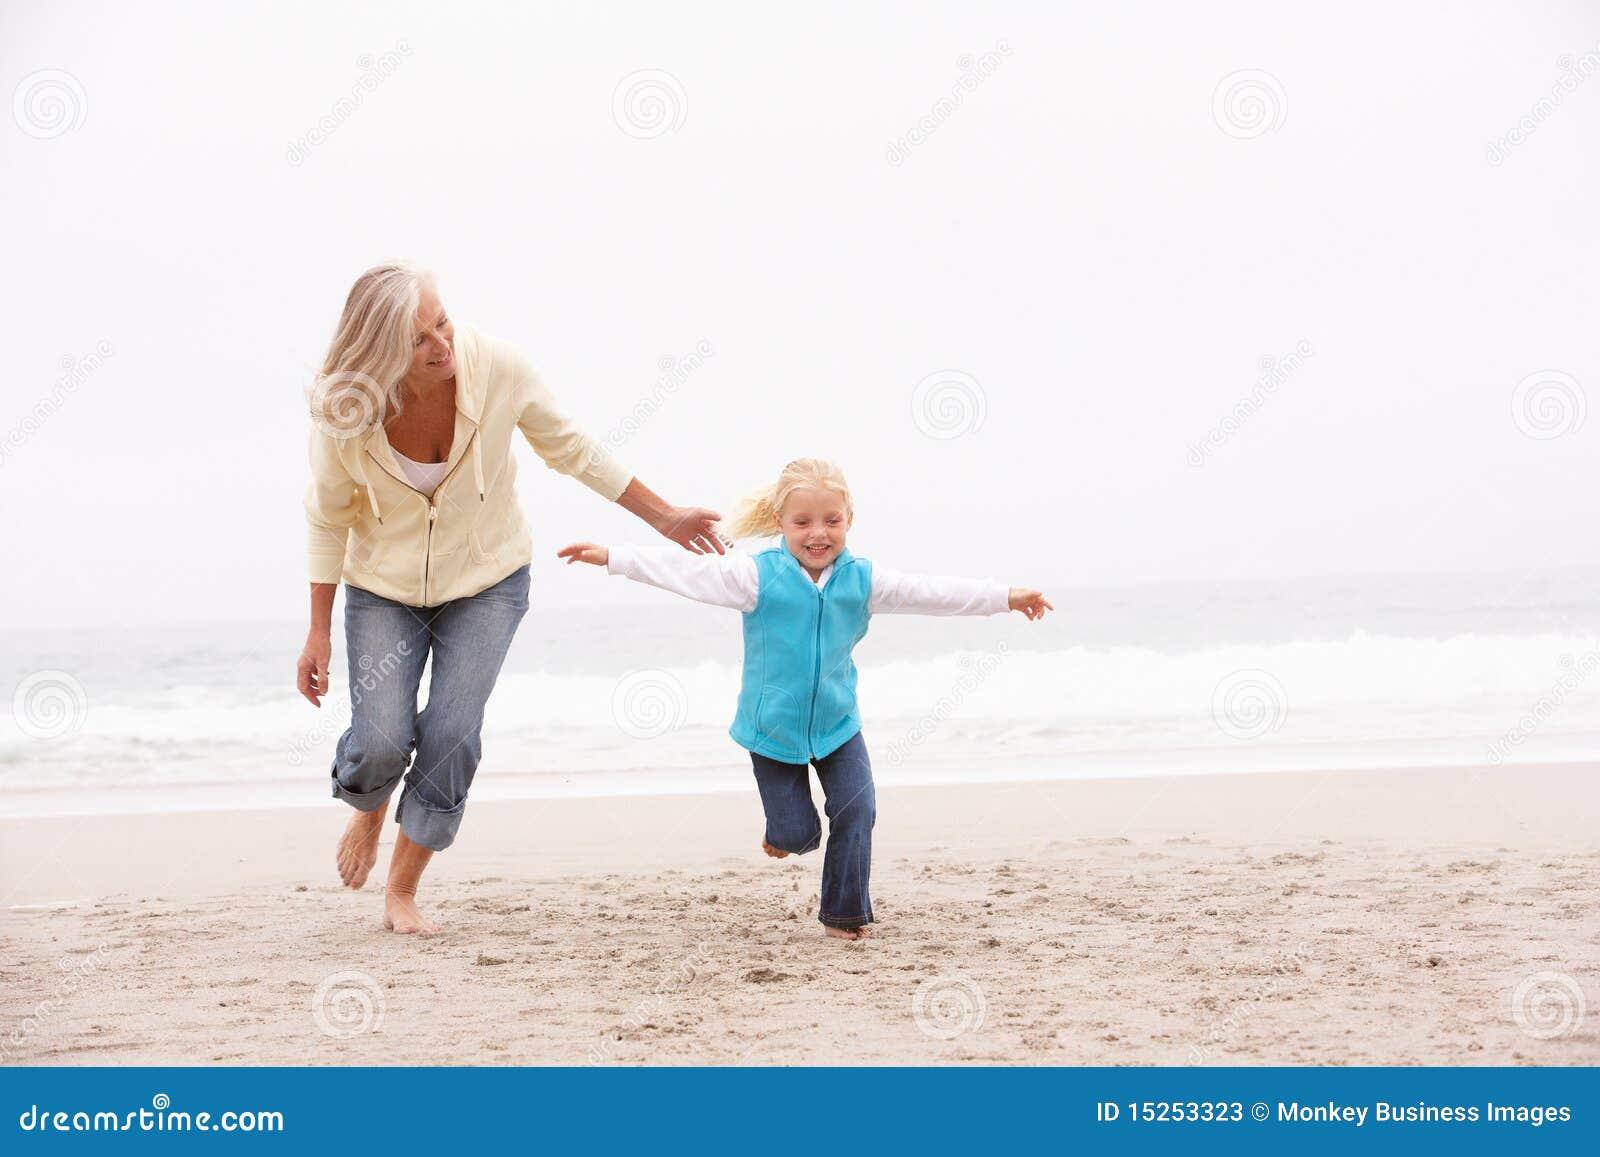 Як внук трахає бабушку 1 фотография